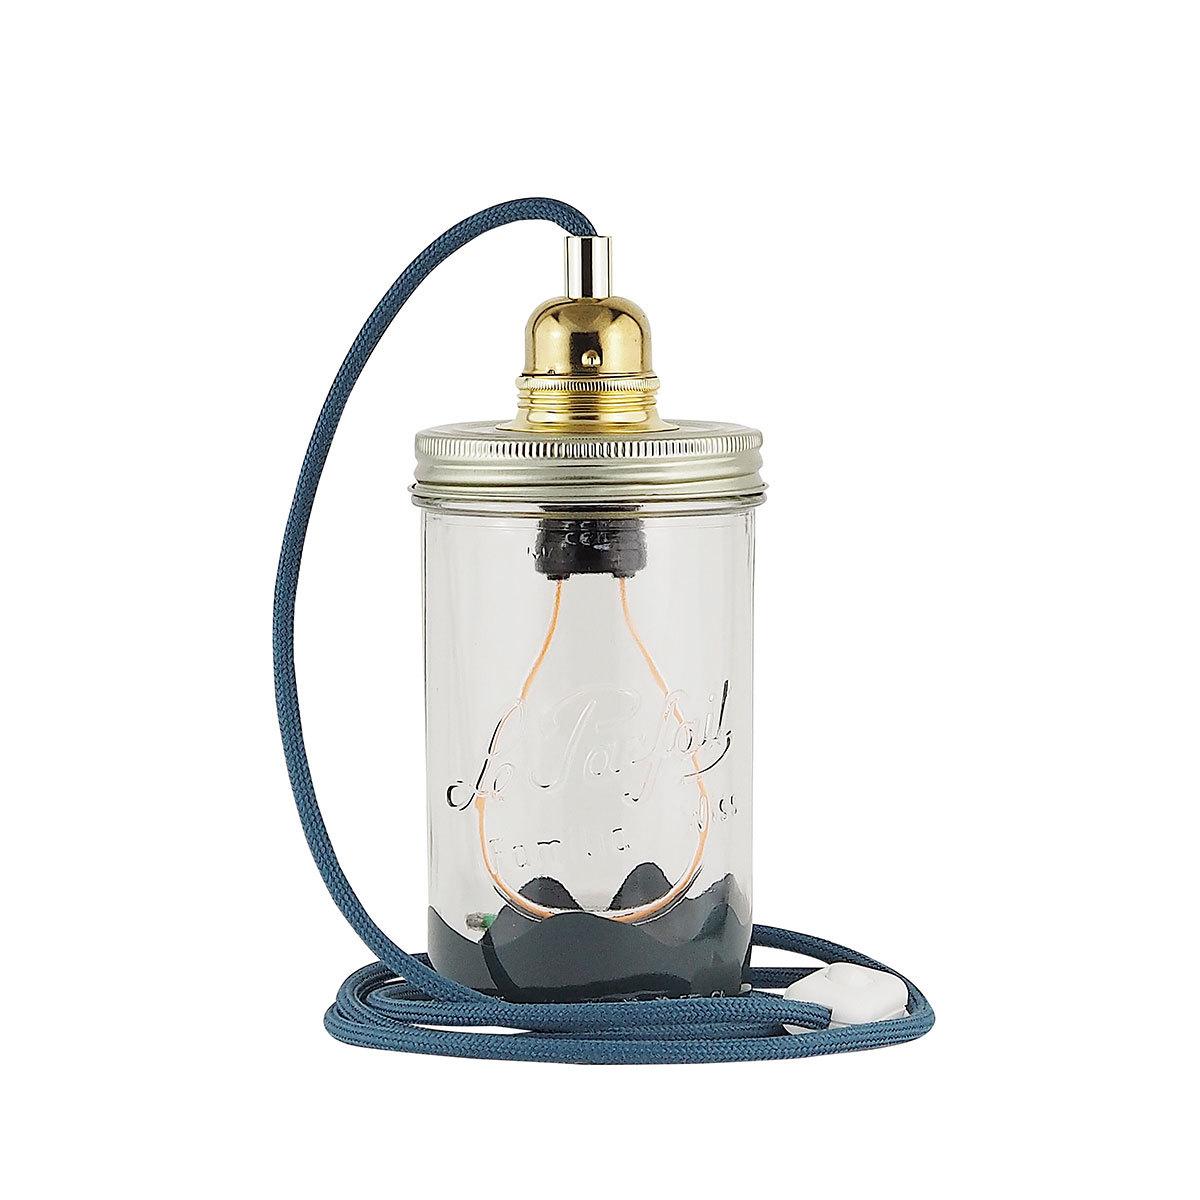 Lampe à poser Lampe Basile - Ampoule Audacieuse Lampe Basile - Ampoule Audacieuse